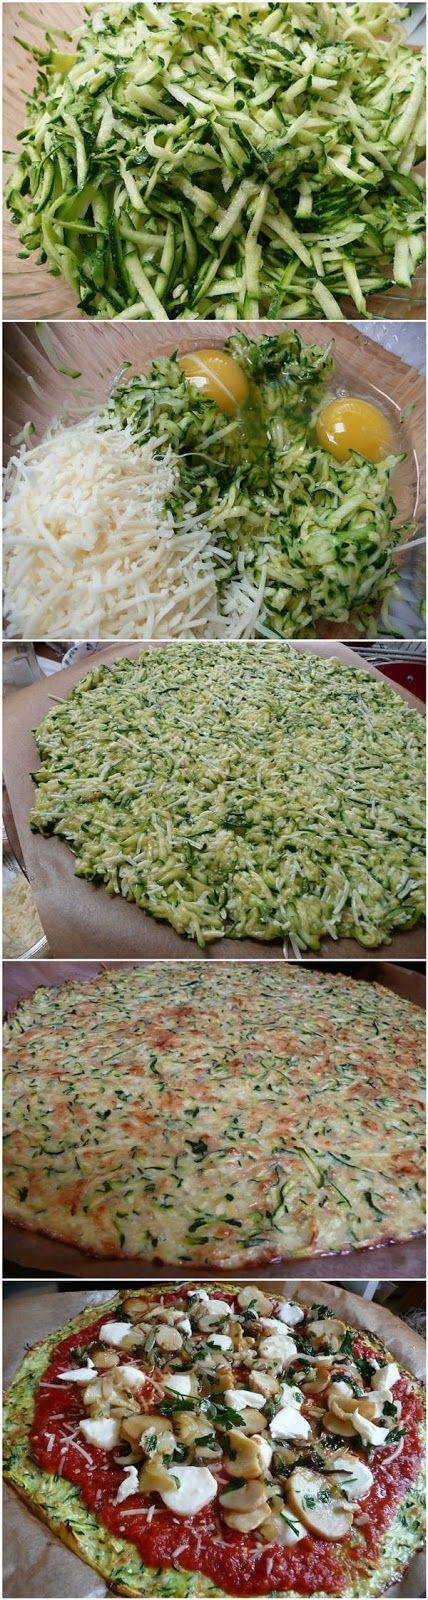 Pizzaboden aus Zucchini kohlenhydratfrei